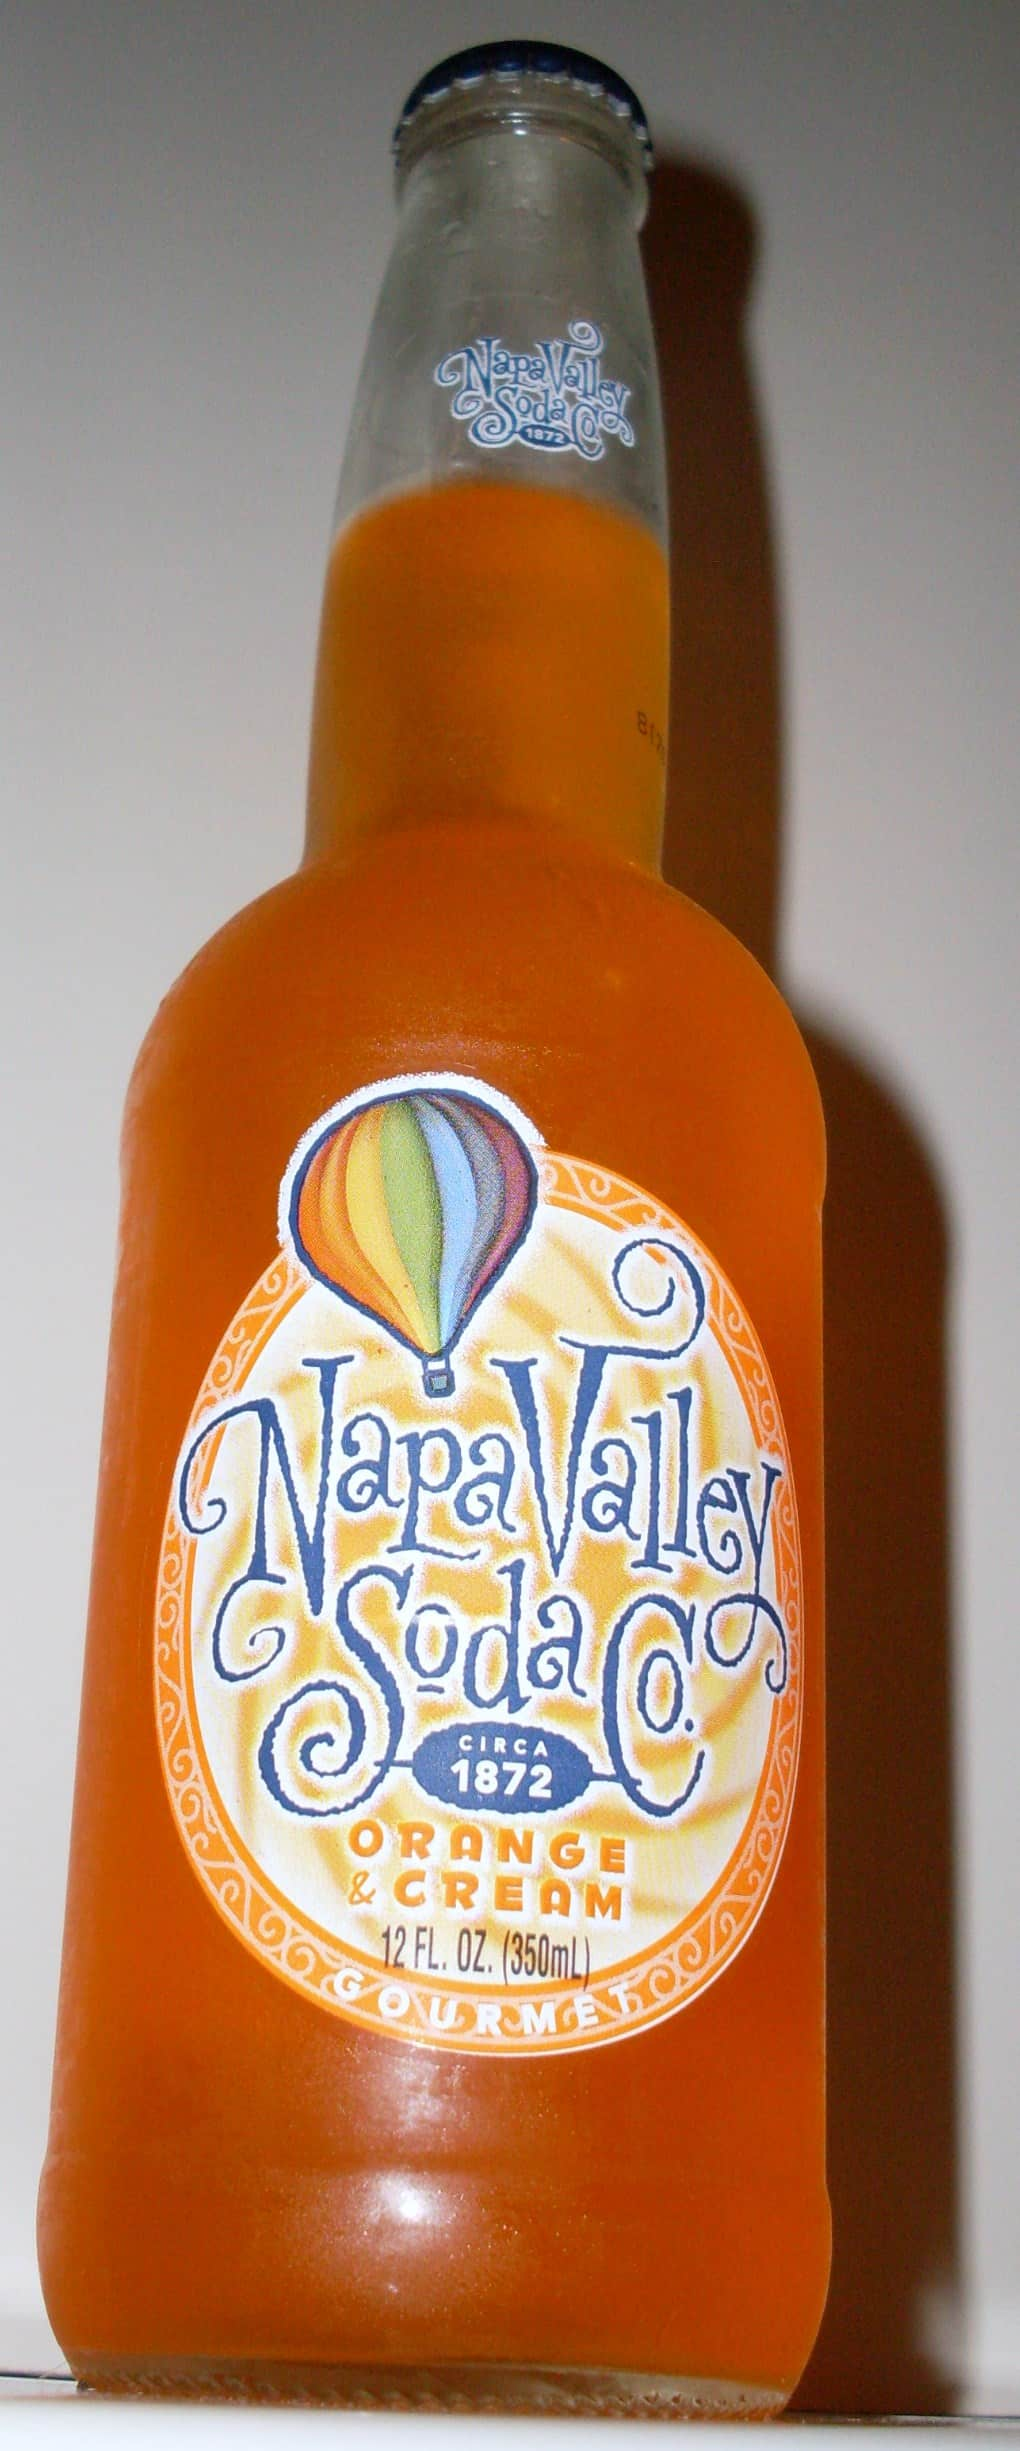 Napa Valley Soda Co. – Orange & Cream